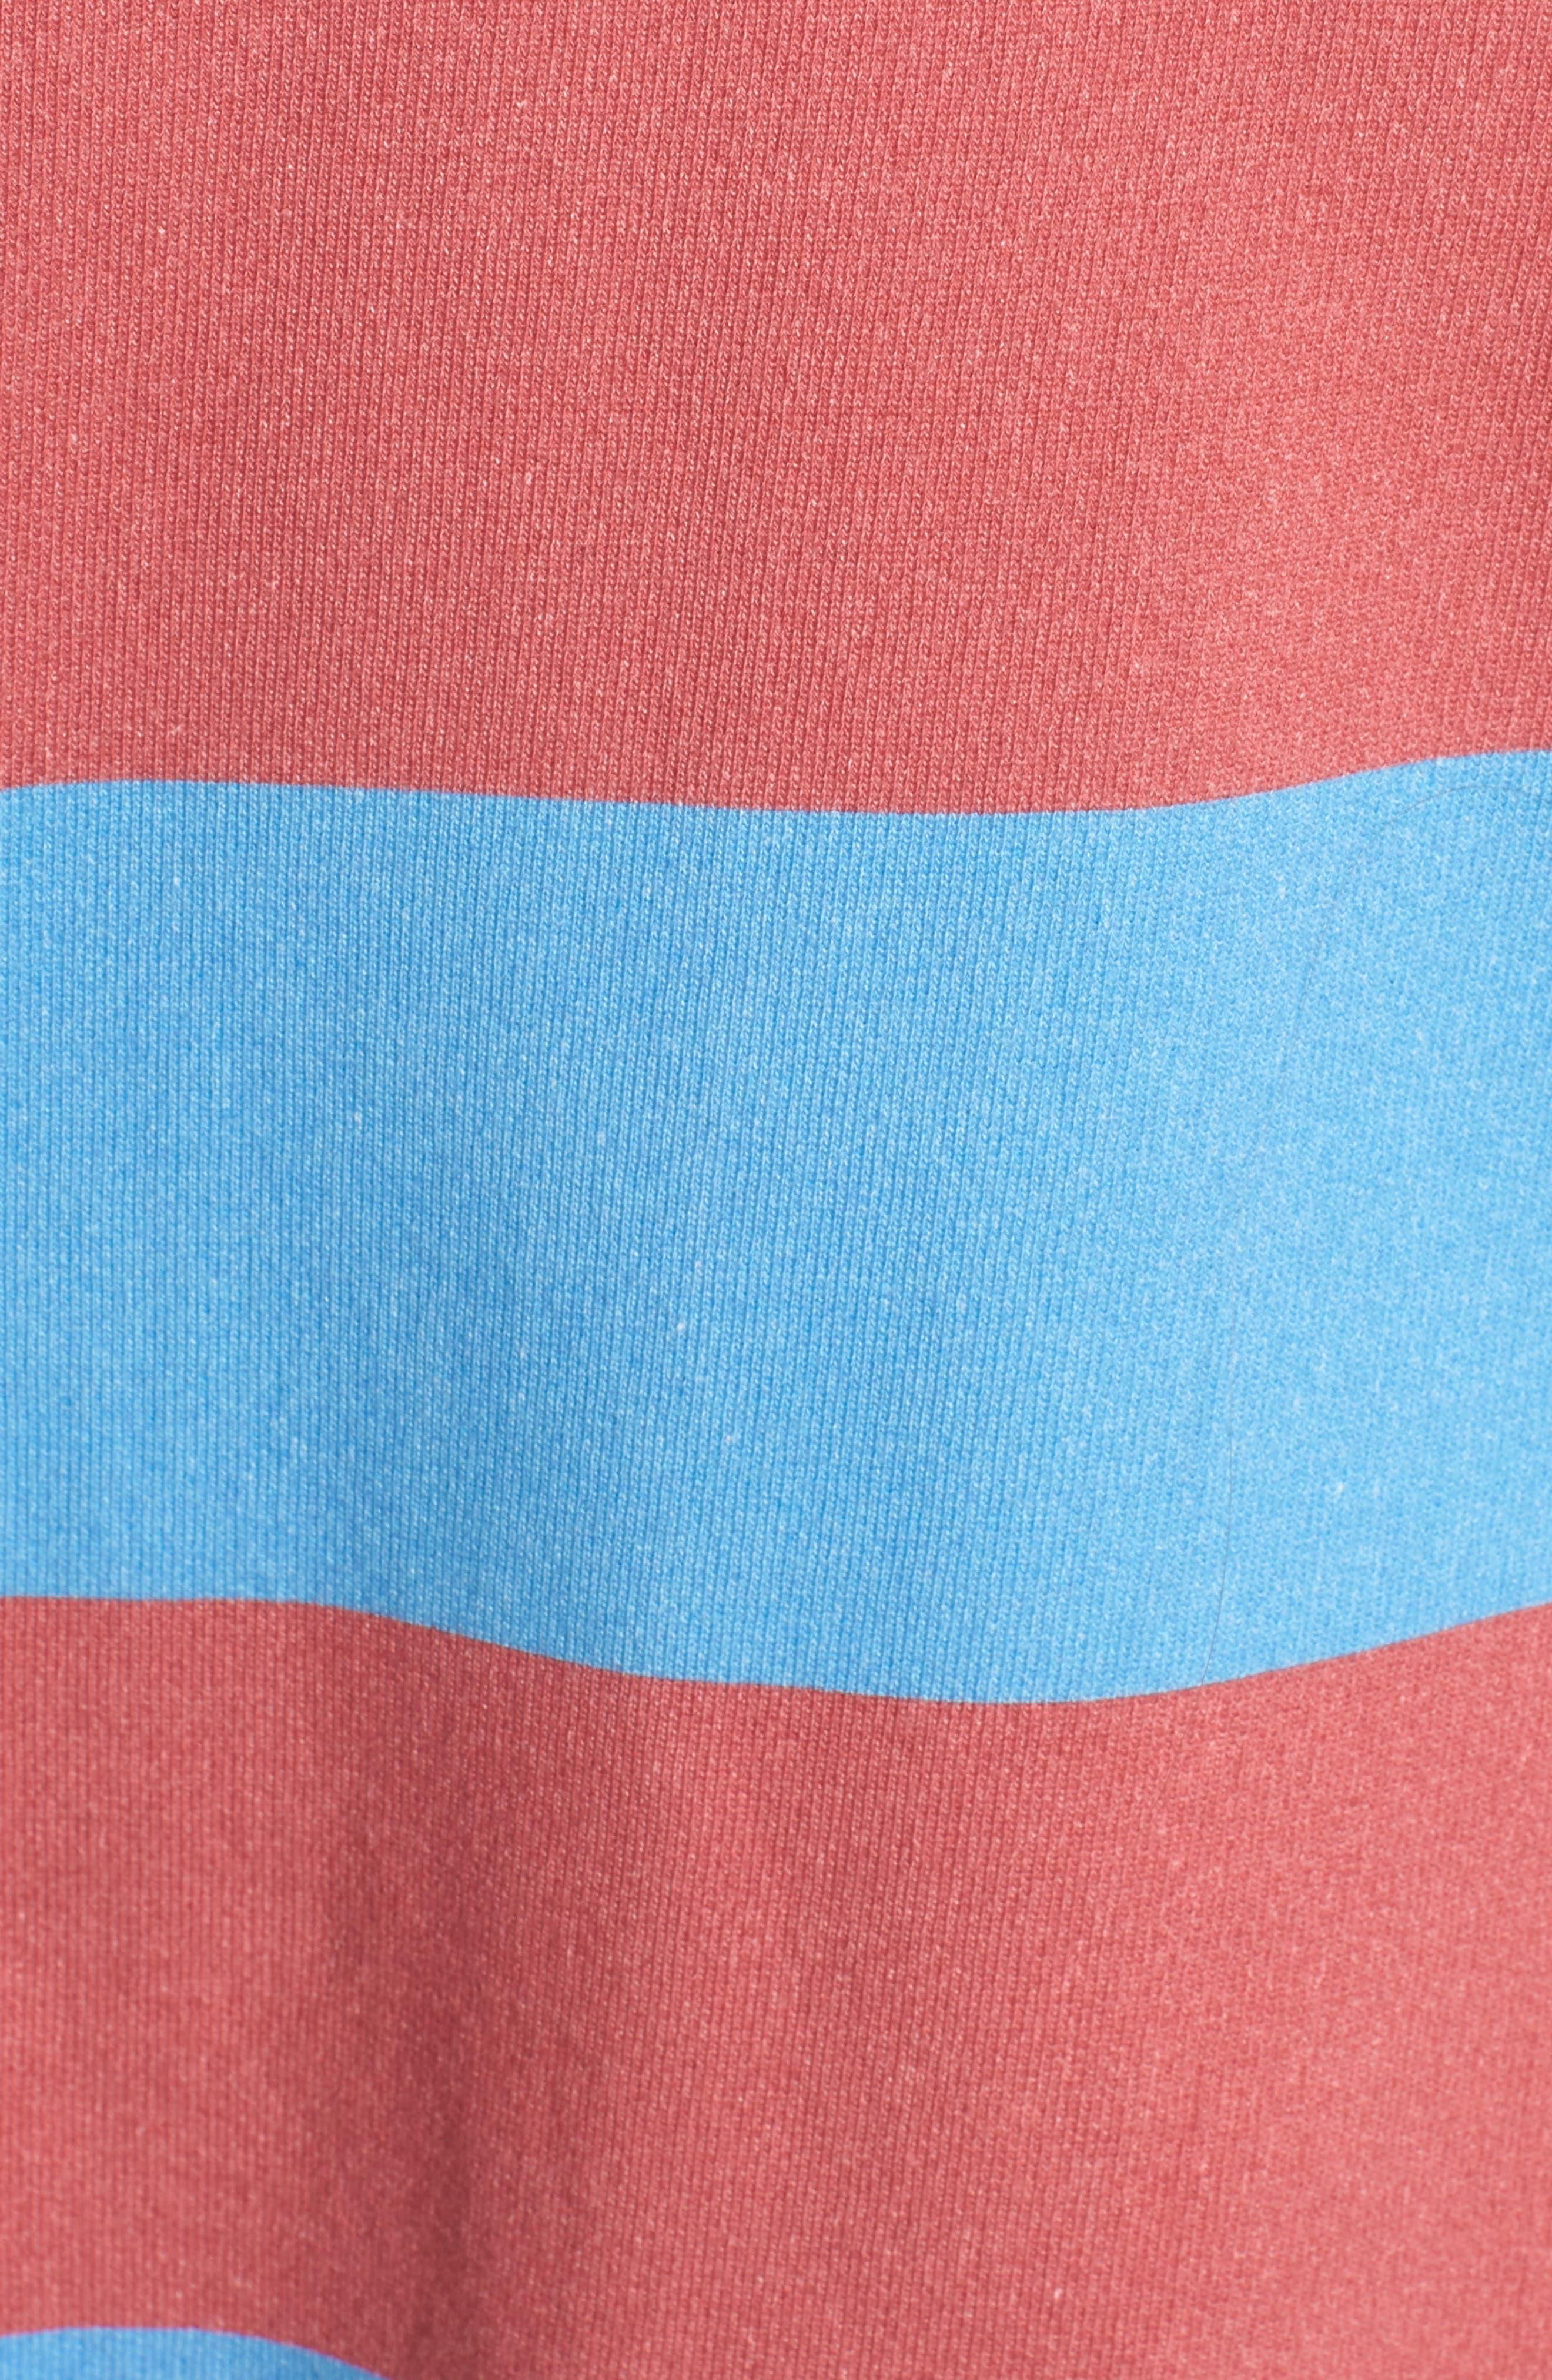 Stripe Crewneck Sweatshirt,                             Alternate thumbnail 6, color,                             601